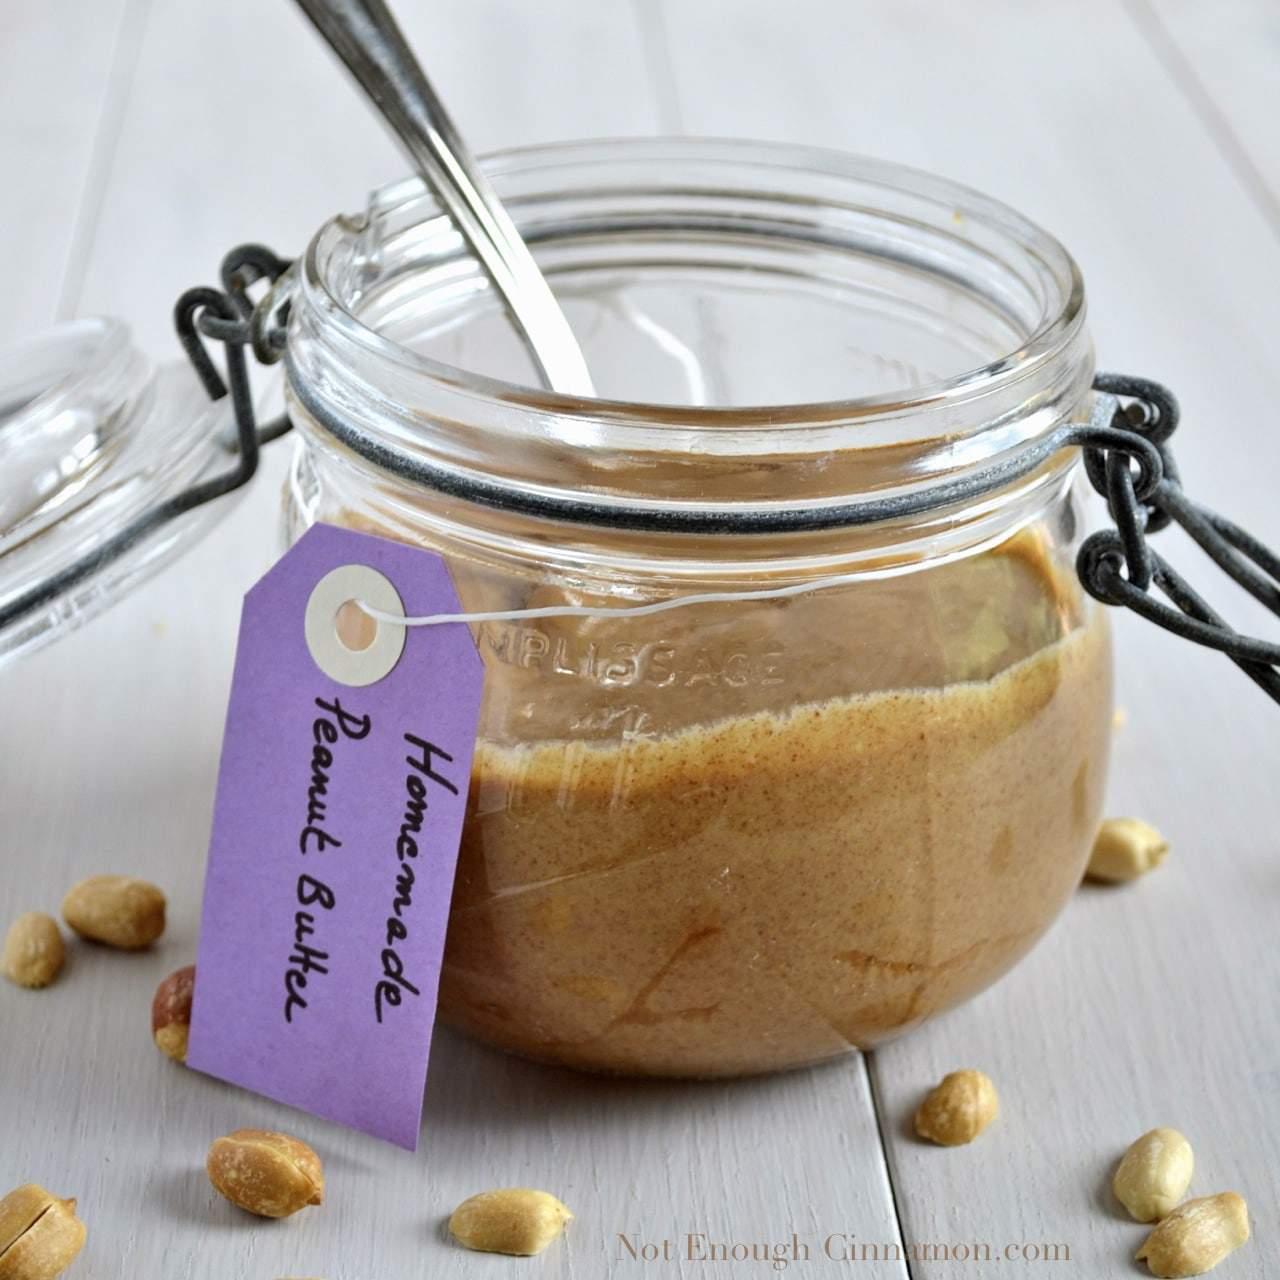 Homemade Peanut Butter - Not Enough Cinnamon